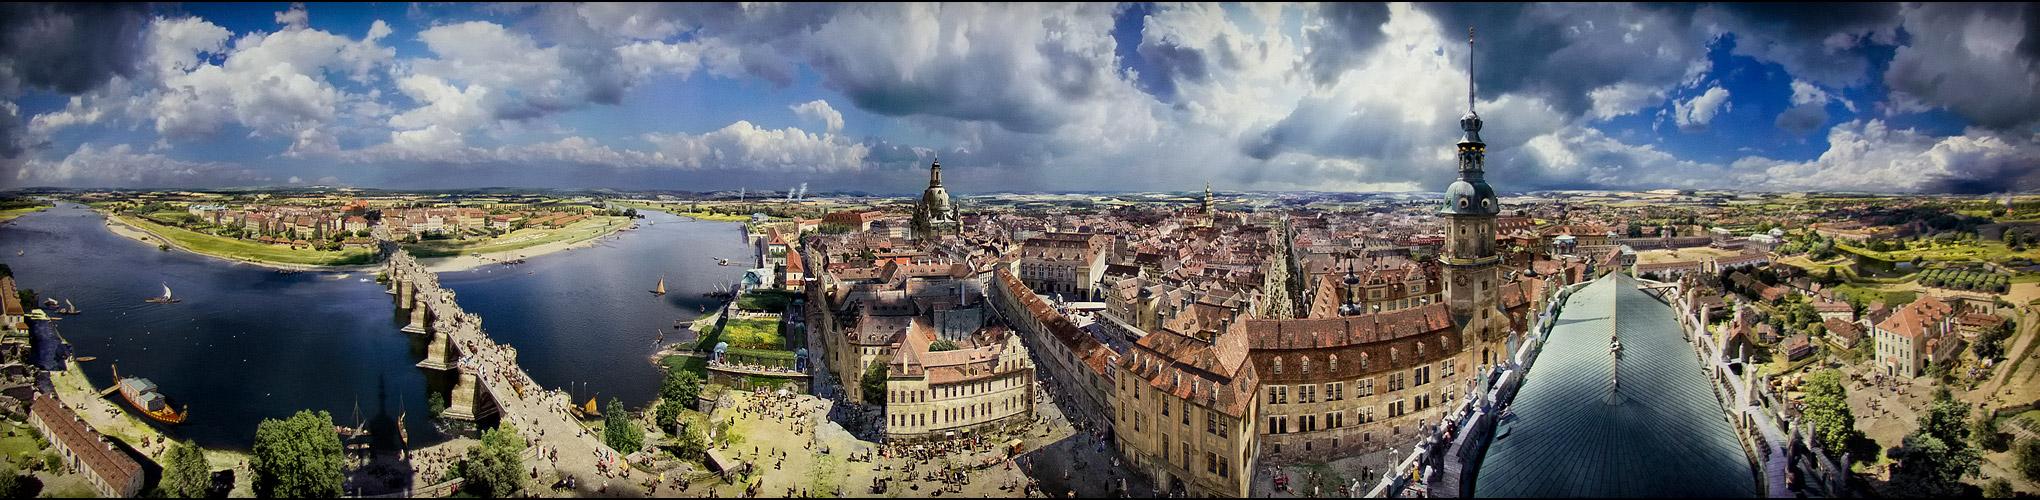 Panometer Dresden 13